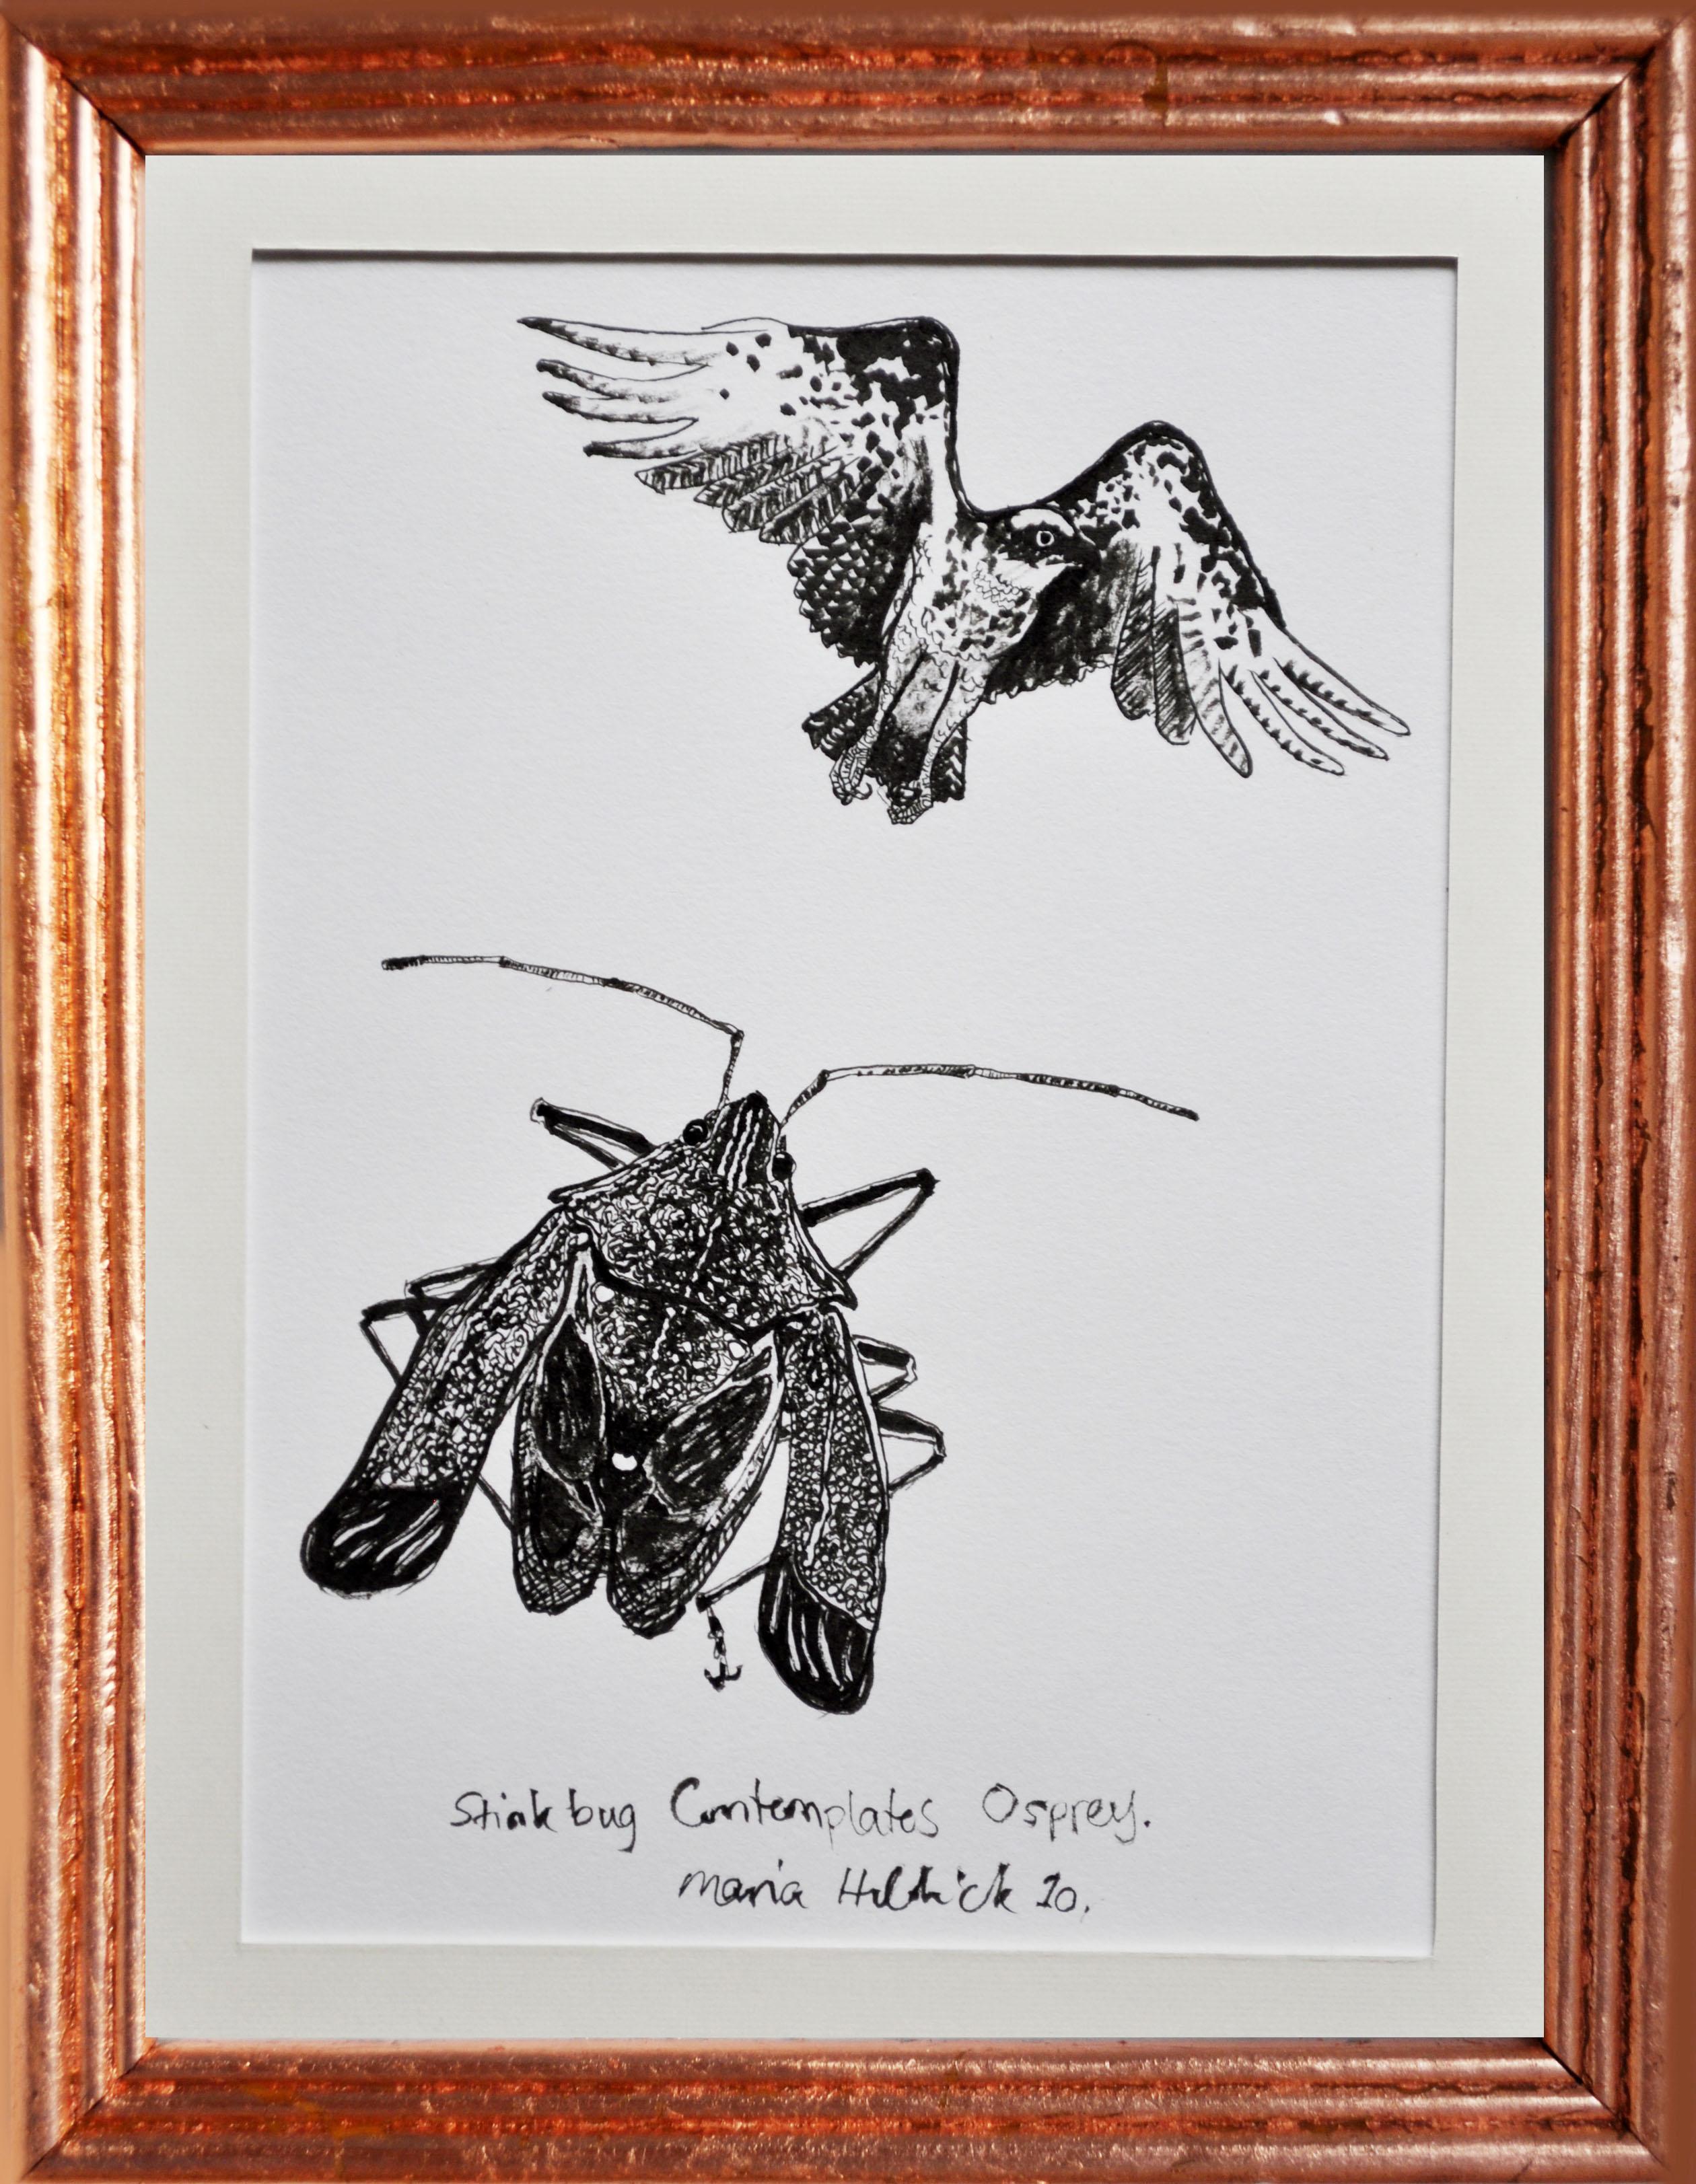 Stink Bug Contemplates Osprey